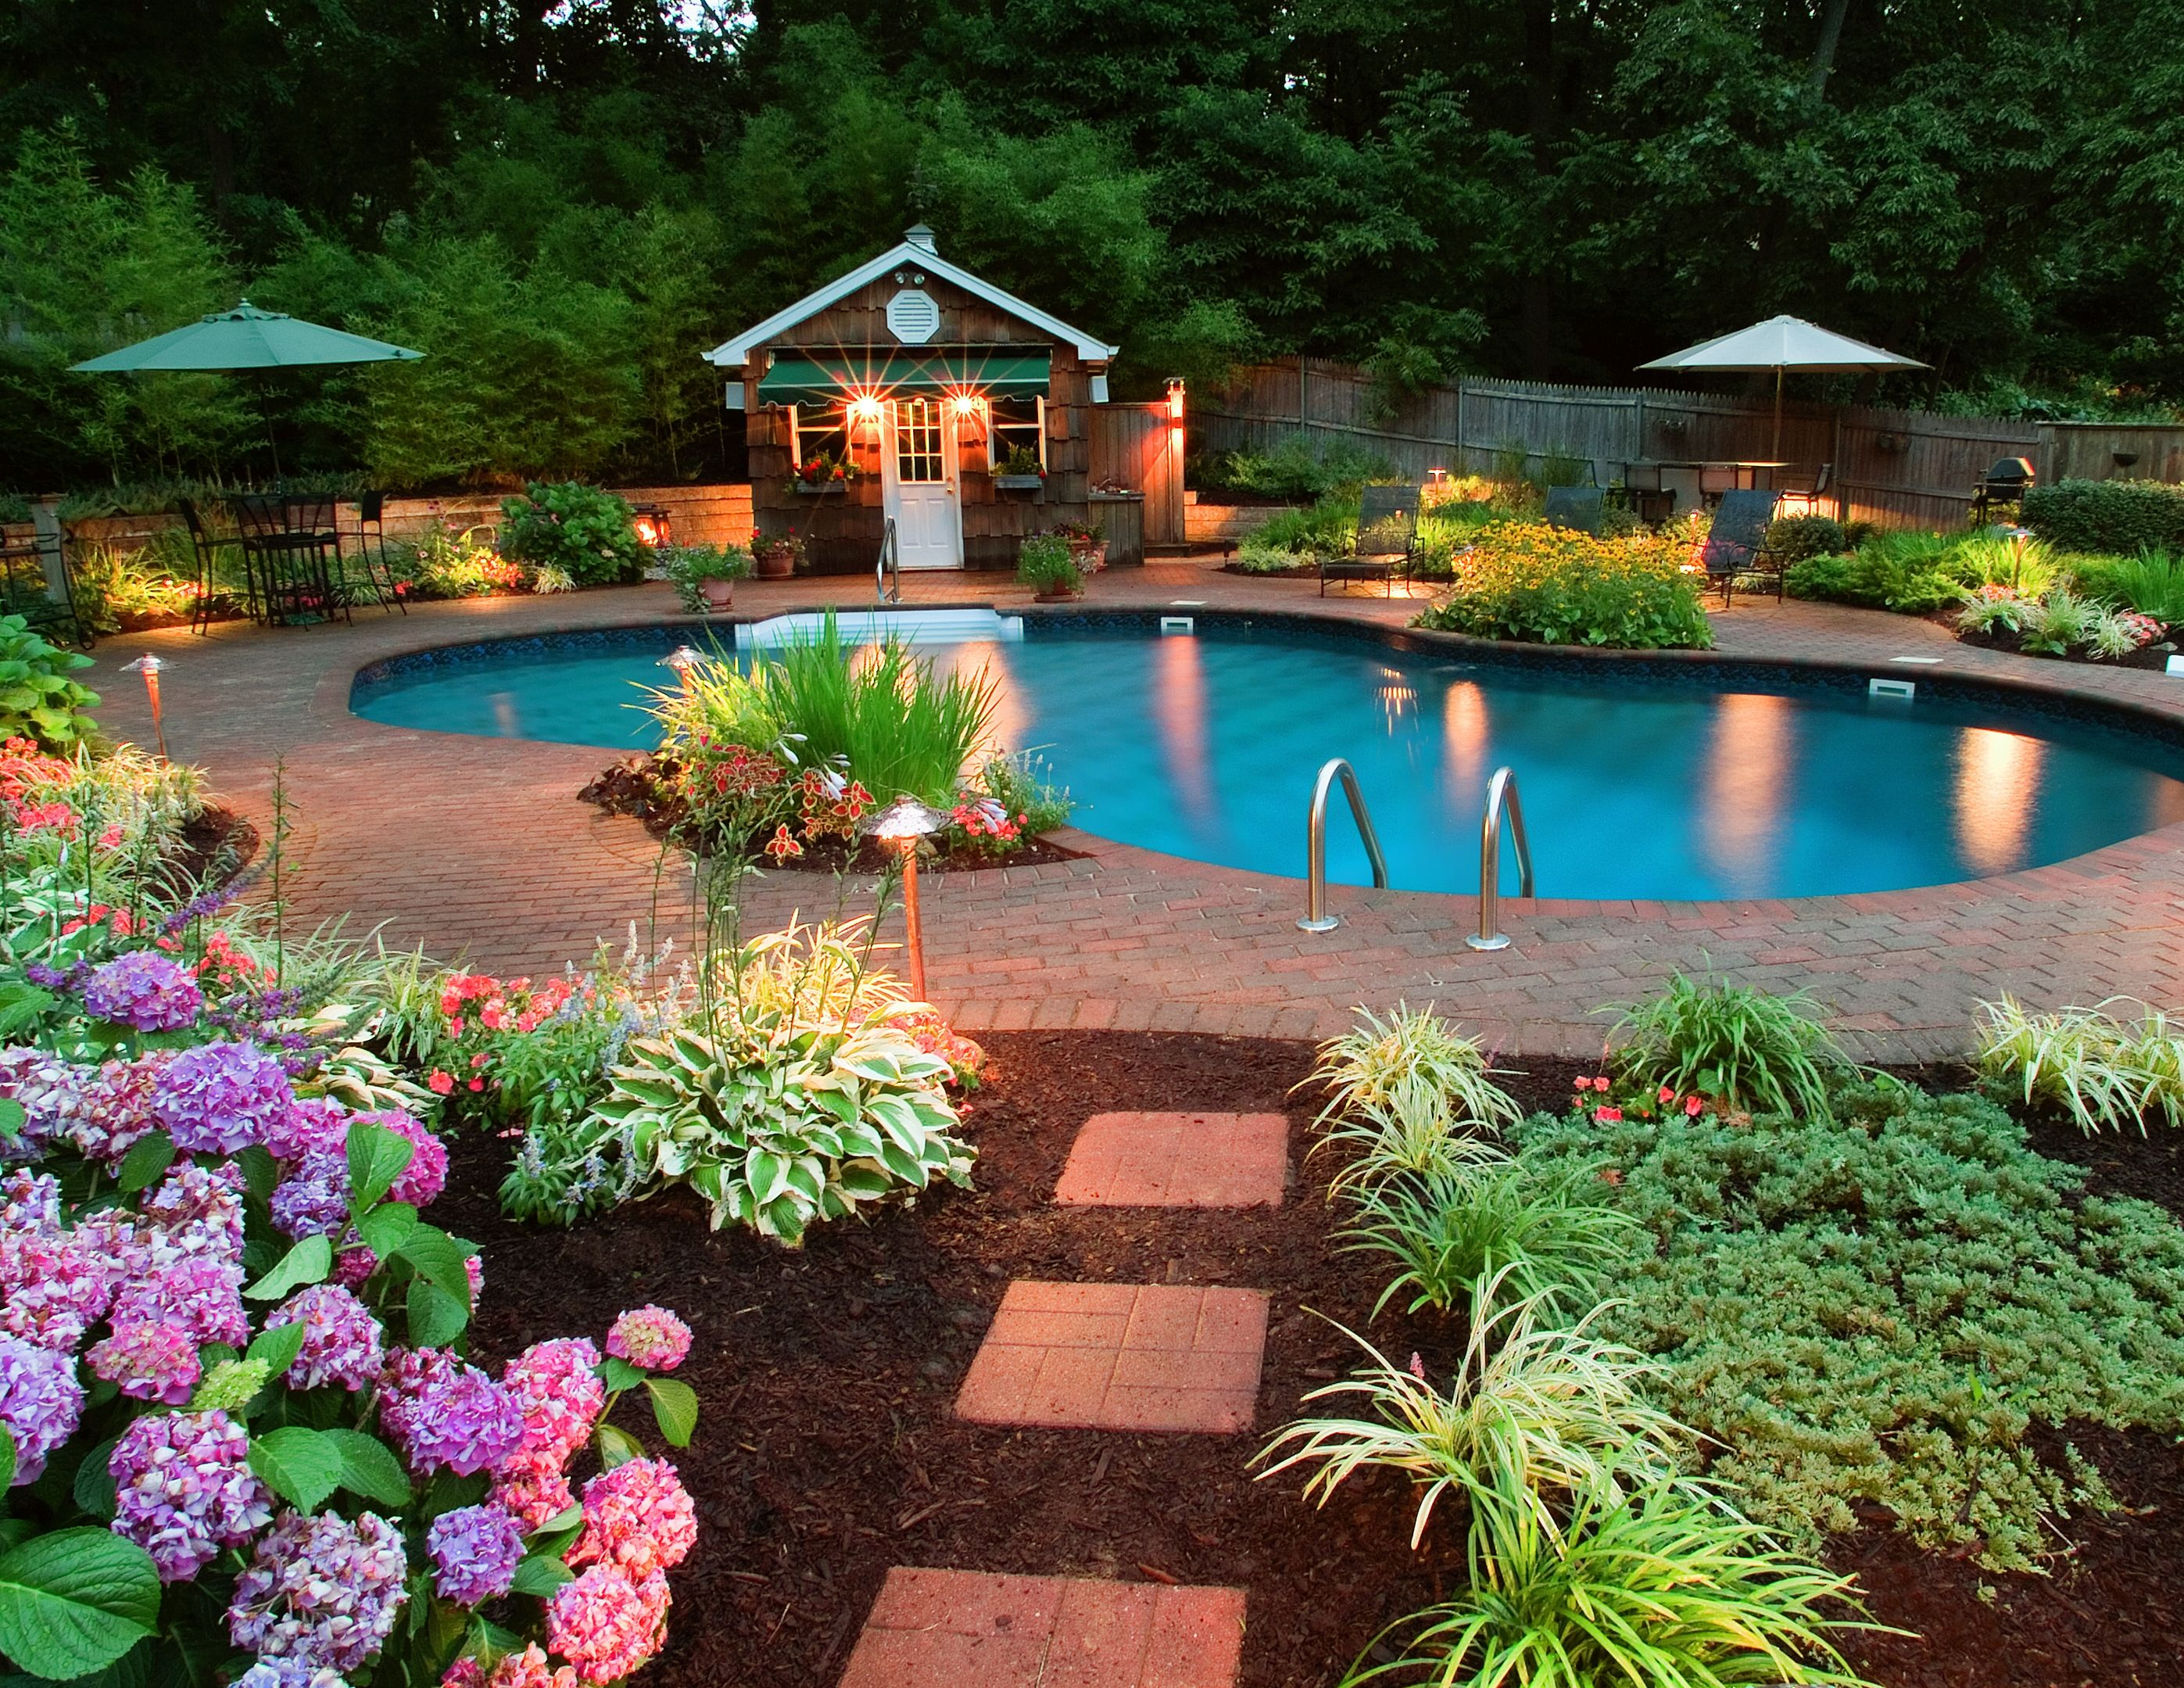 Backyard Pool Landscaping Ideas Pool Landscaping Dream Backyard Backyard Pool